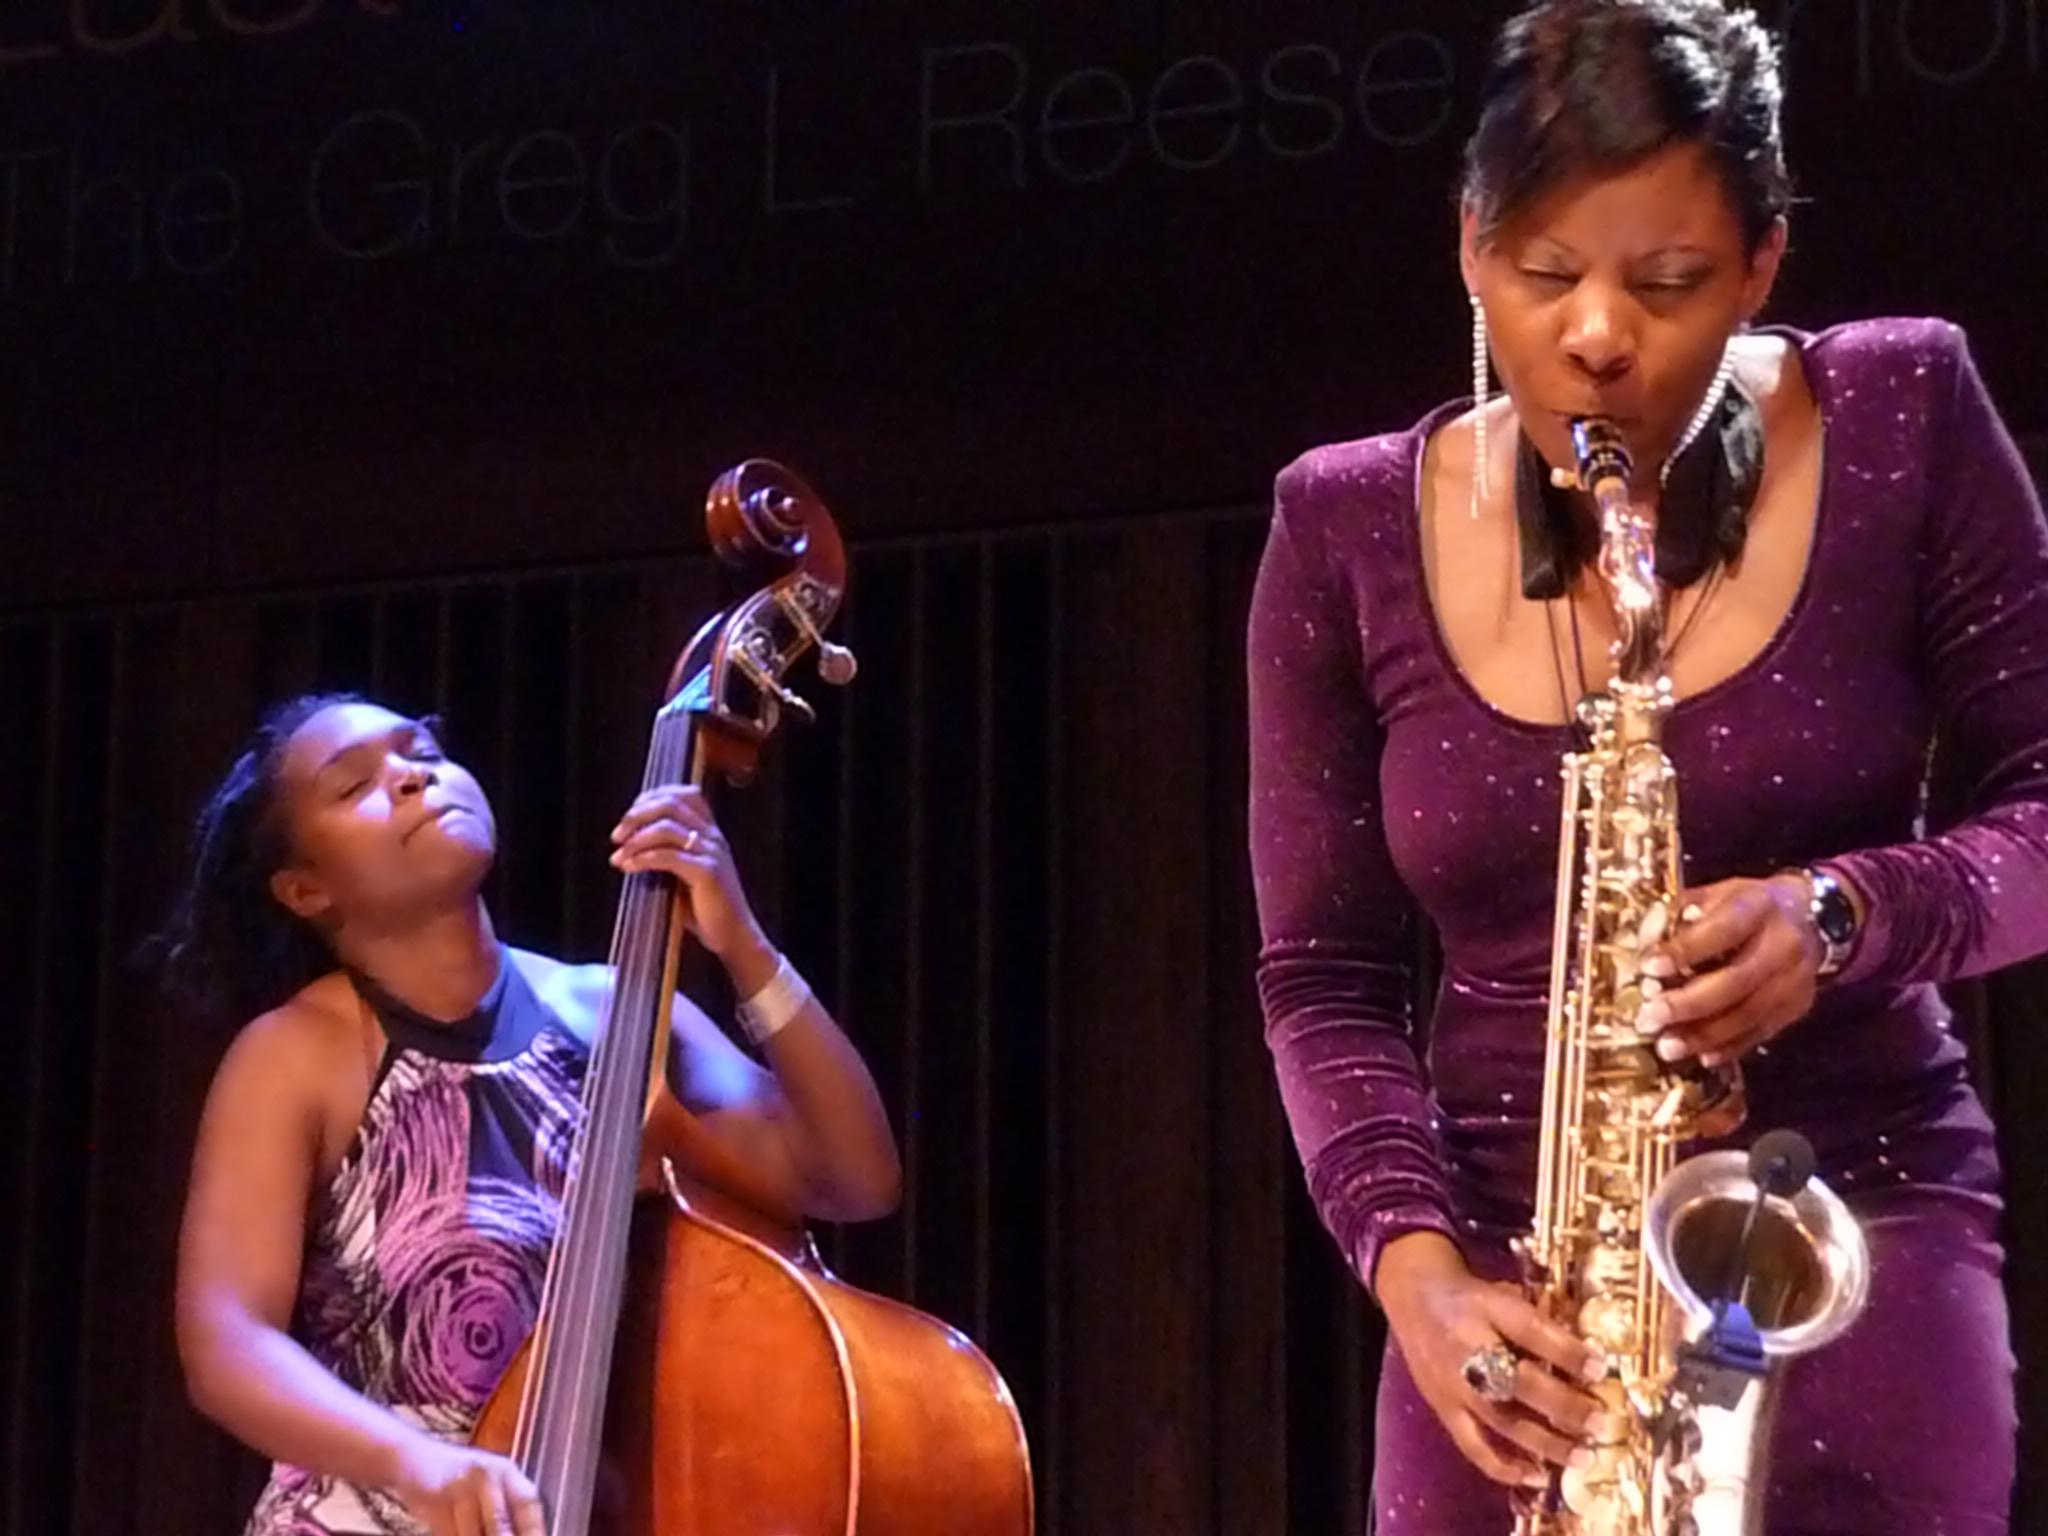 Mimi Jones and Tia Fuller at Tri-C Jazzfest Cleveland 2011